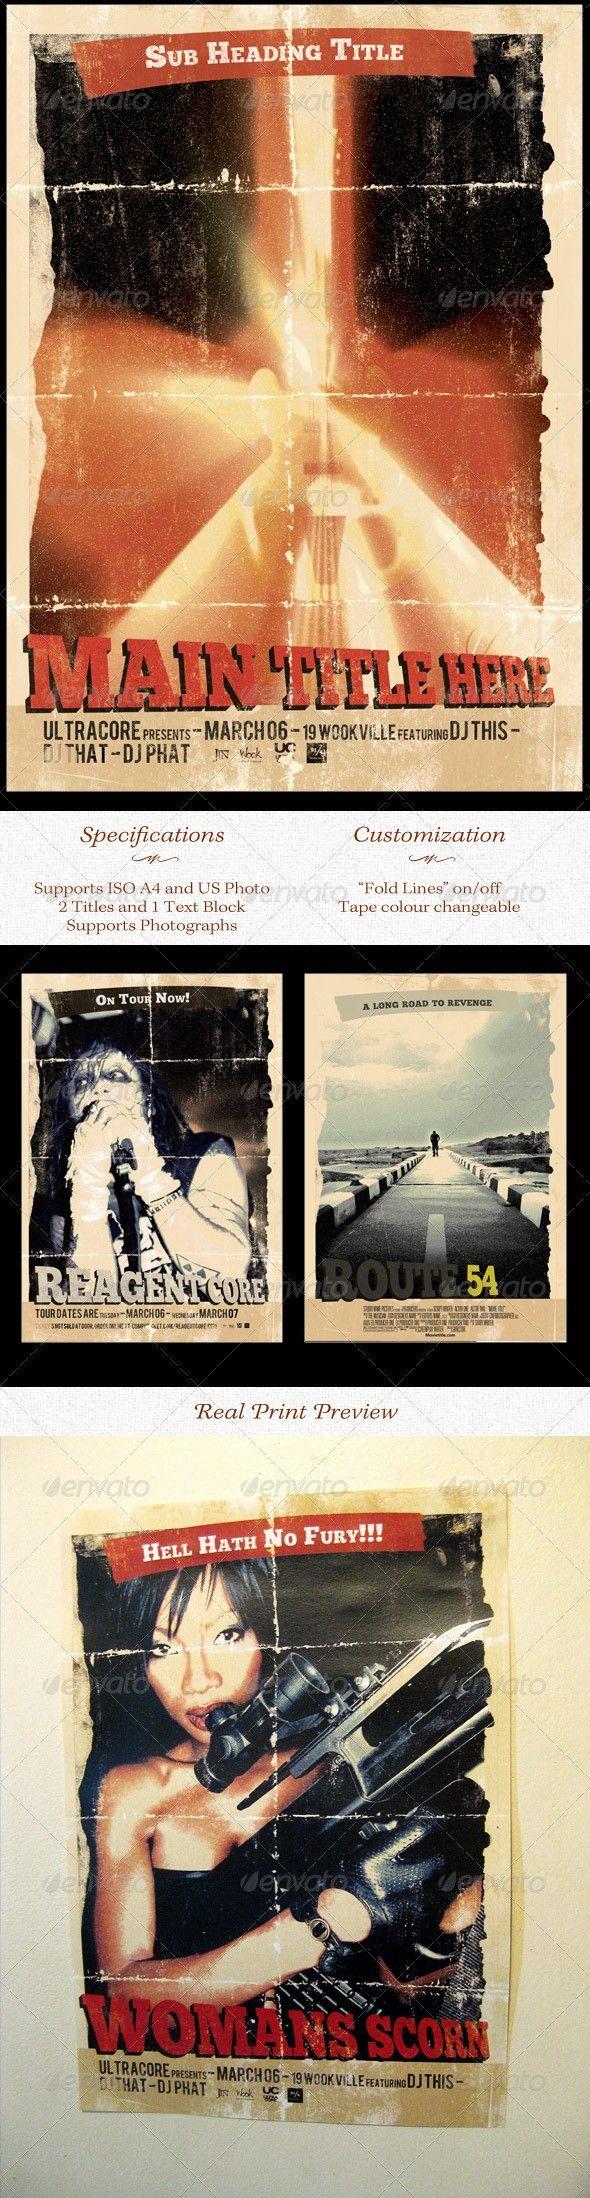 grindhouse theatre poster template flyer design pinterest